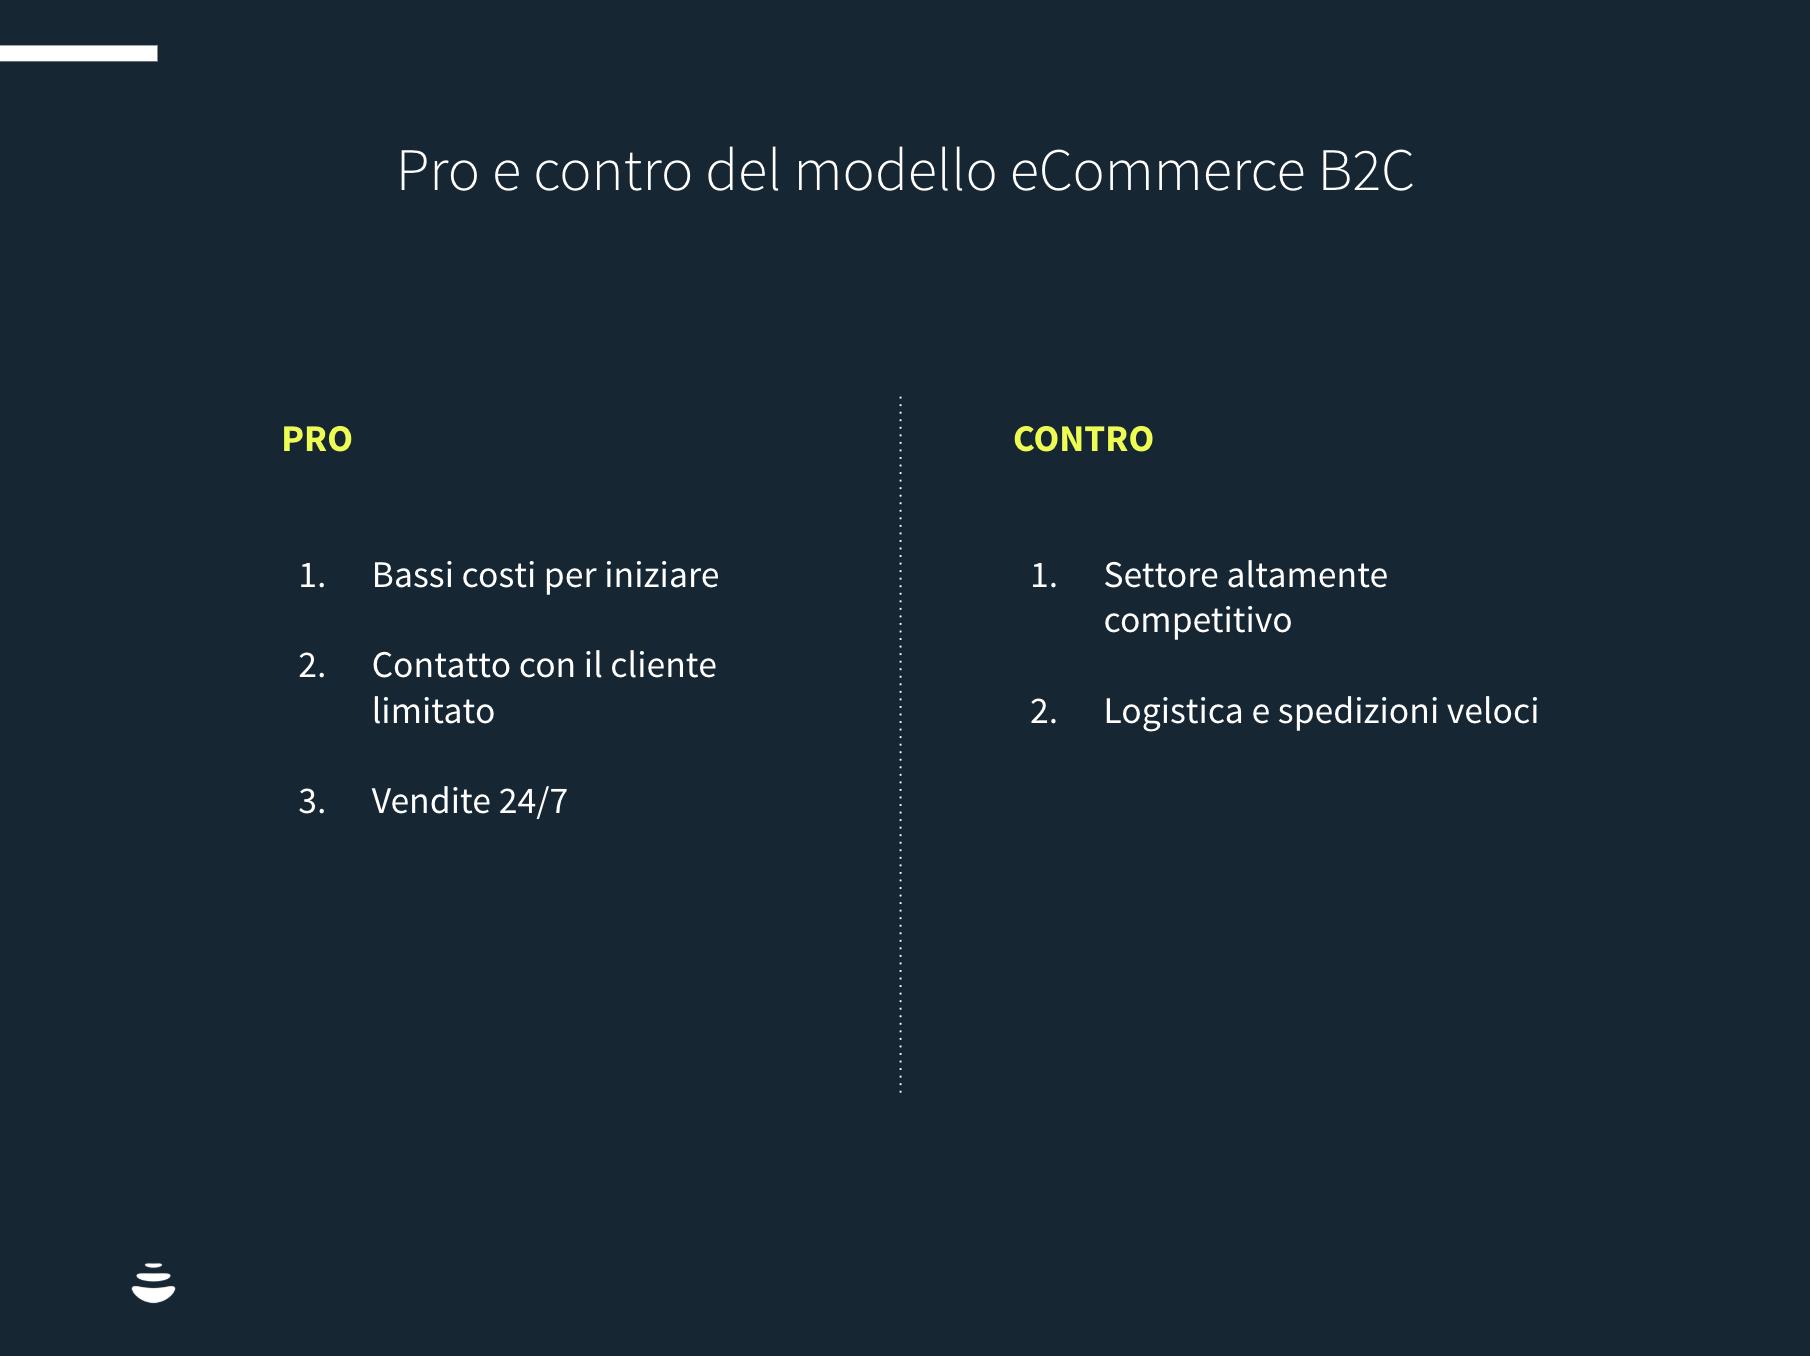 modello ecommerce B2C